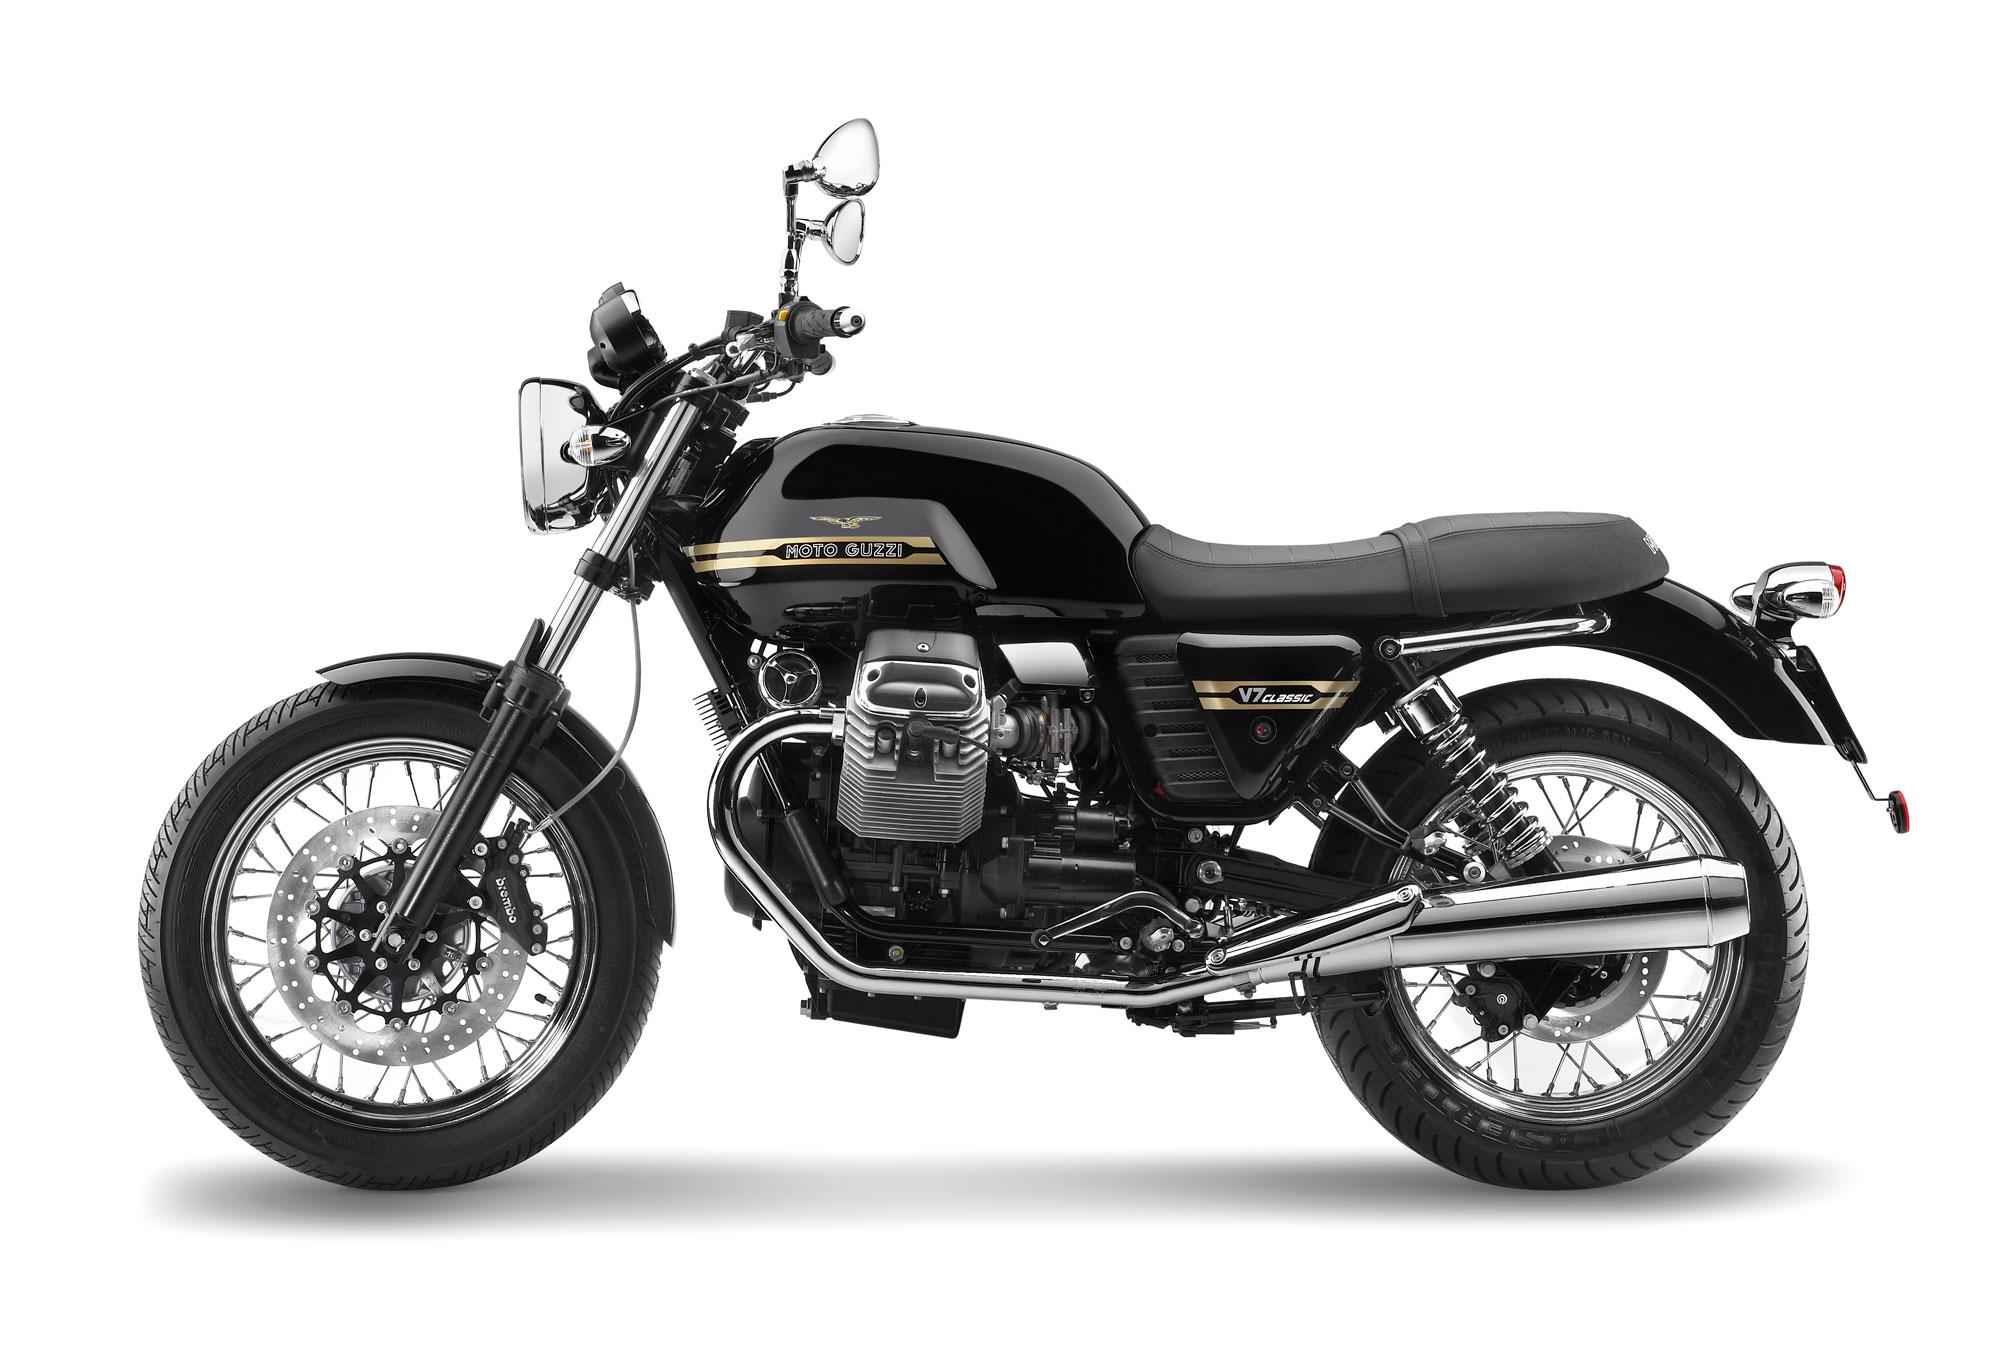 moto guzzi v7 classic specs 2012 2013 autoevolution. Black Bedroom Furniture Sets. Home Design Ideas